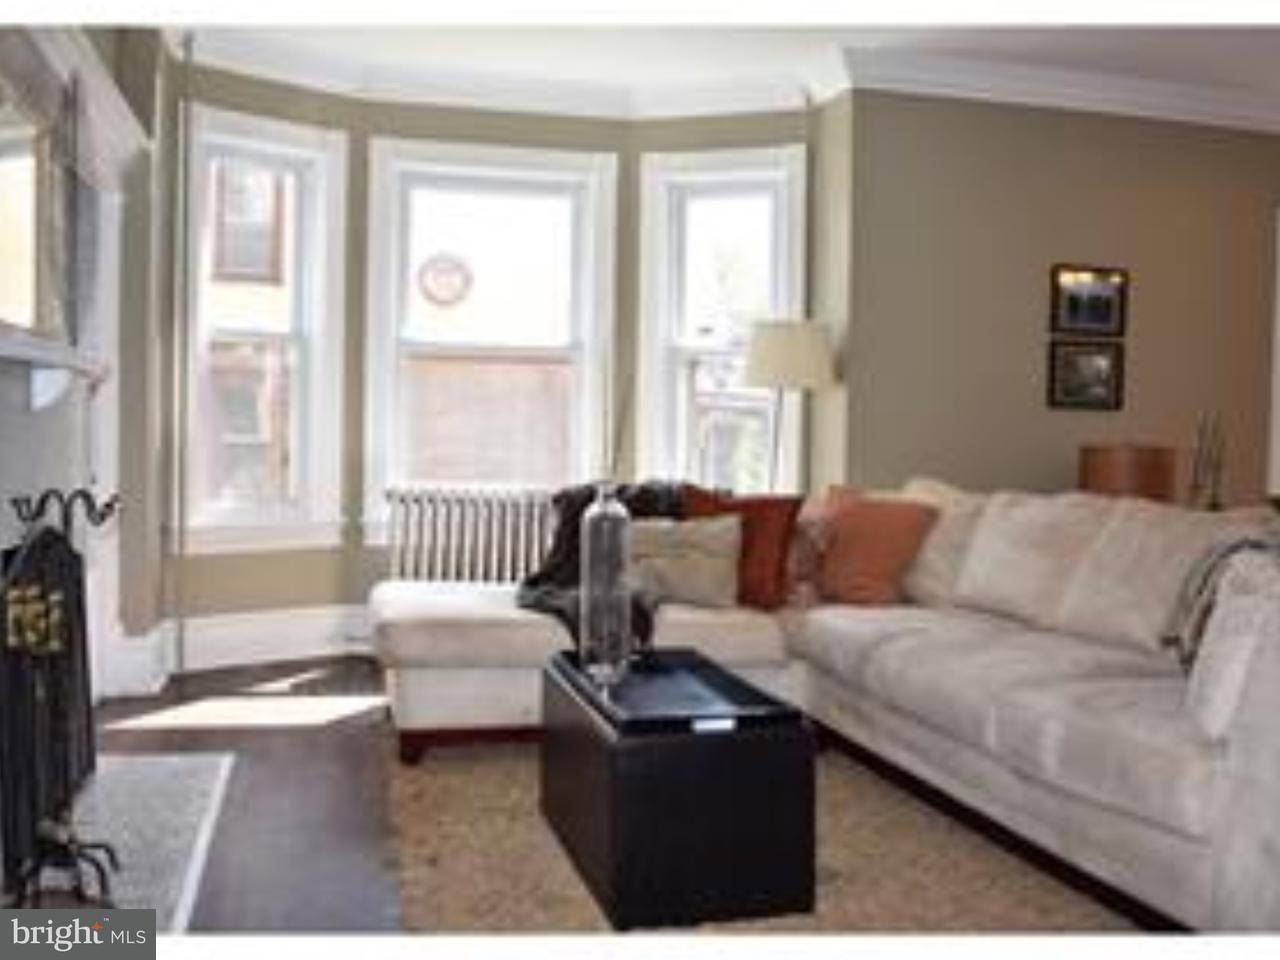 Single Family Home for Rent at 11 OWEN Avenue Lansdowne, Pennsylvania 19050 United States